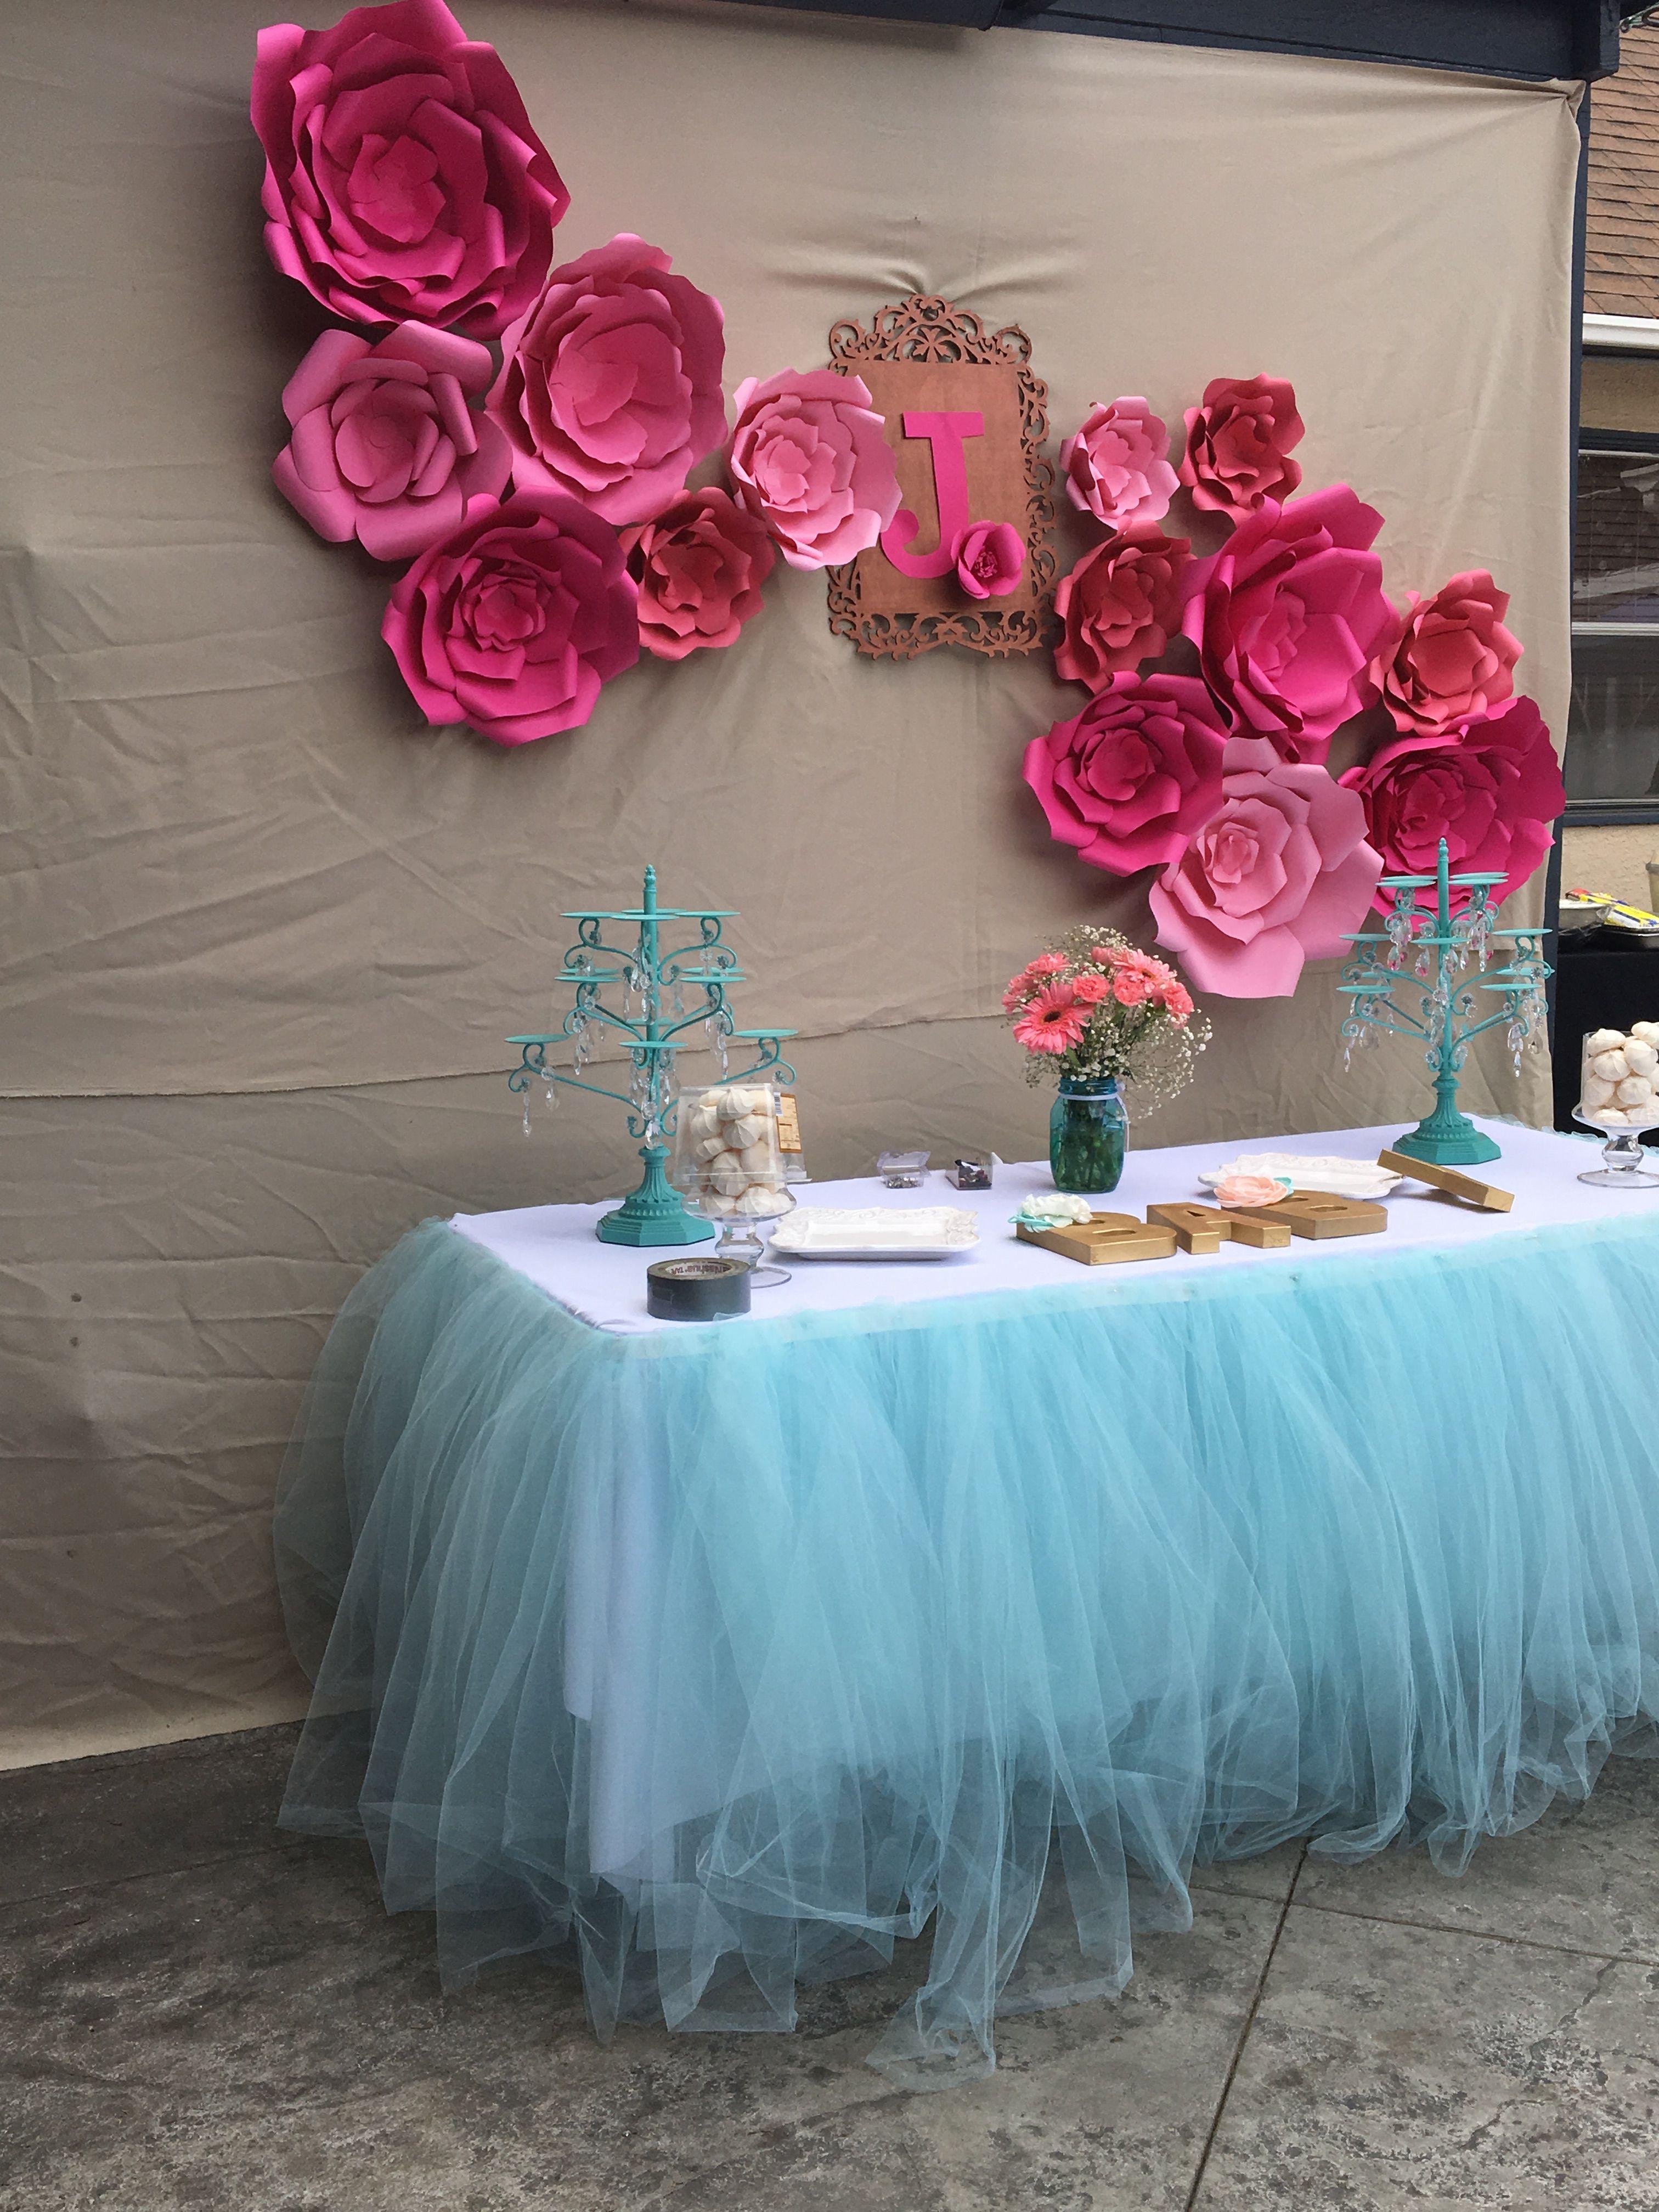 Paper Flower Backdrop For Birthday Wedding Babyshower Celebration Candy Table Decoration Decoracion Con Flores Decoracion Fiesta Decoracion De Eventos